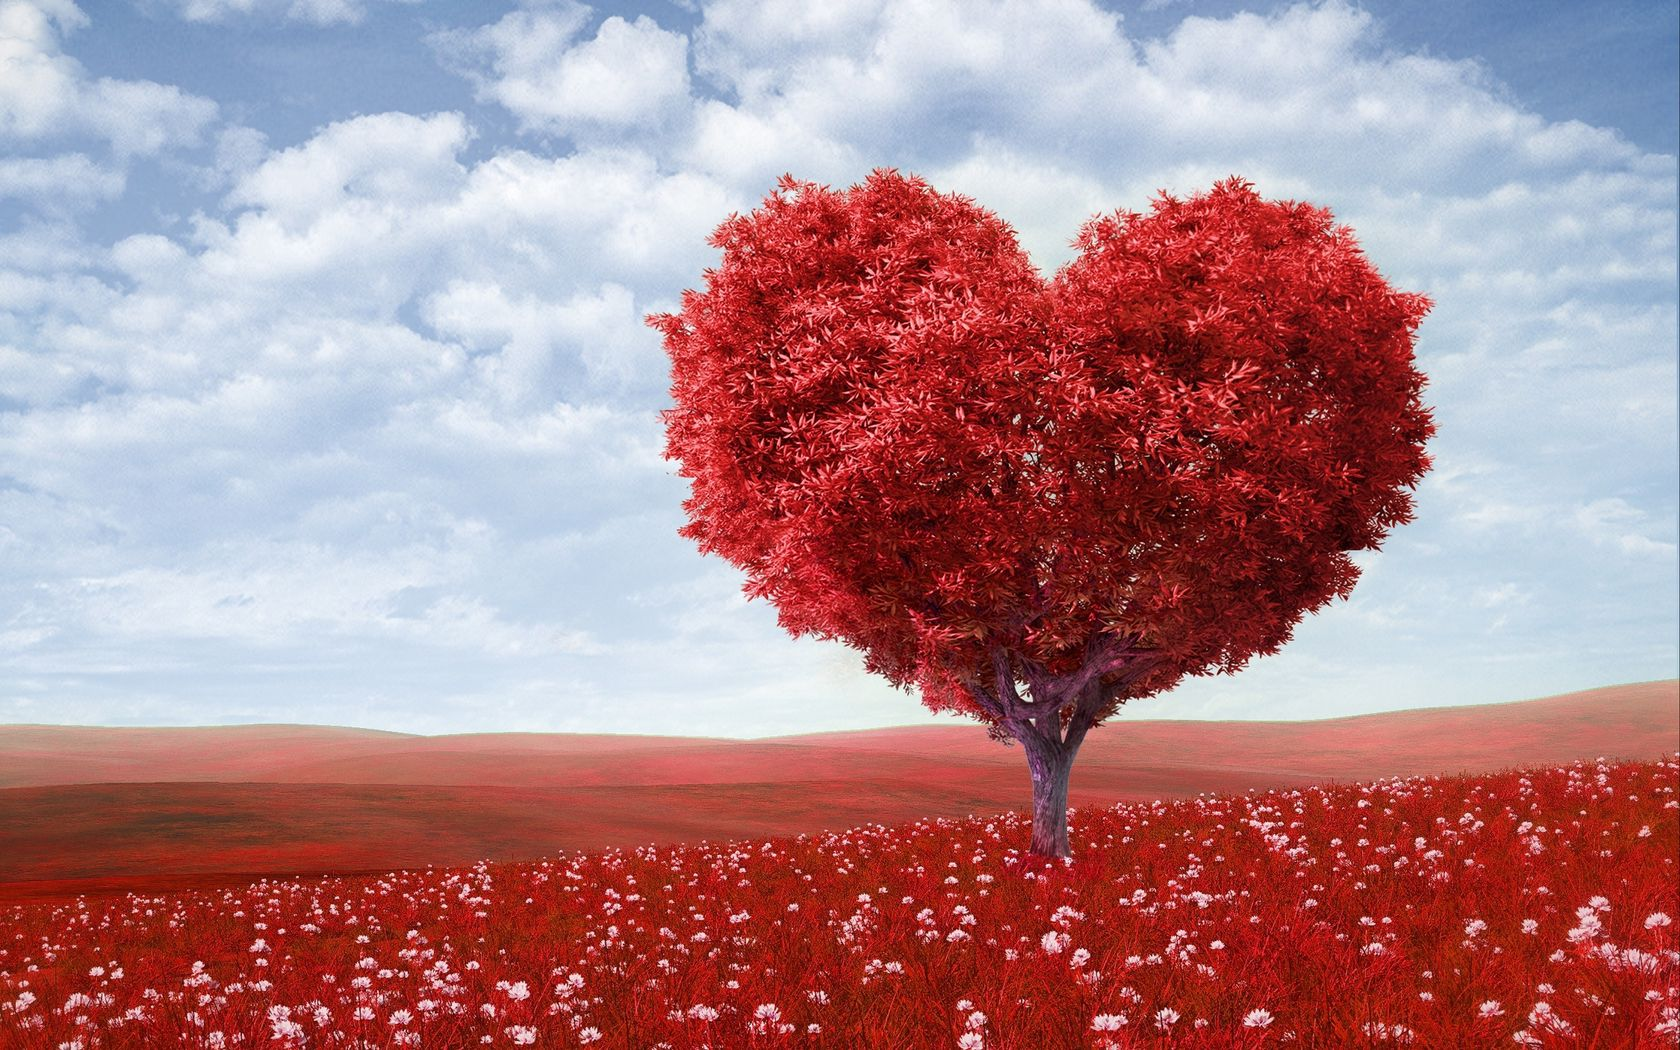 1680x1050 Wallpaper tree, heart, photoshop, field, grass, romance